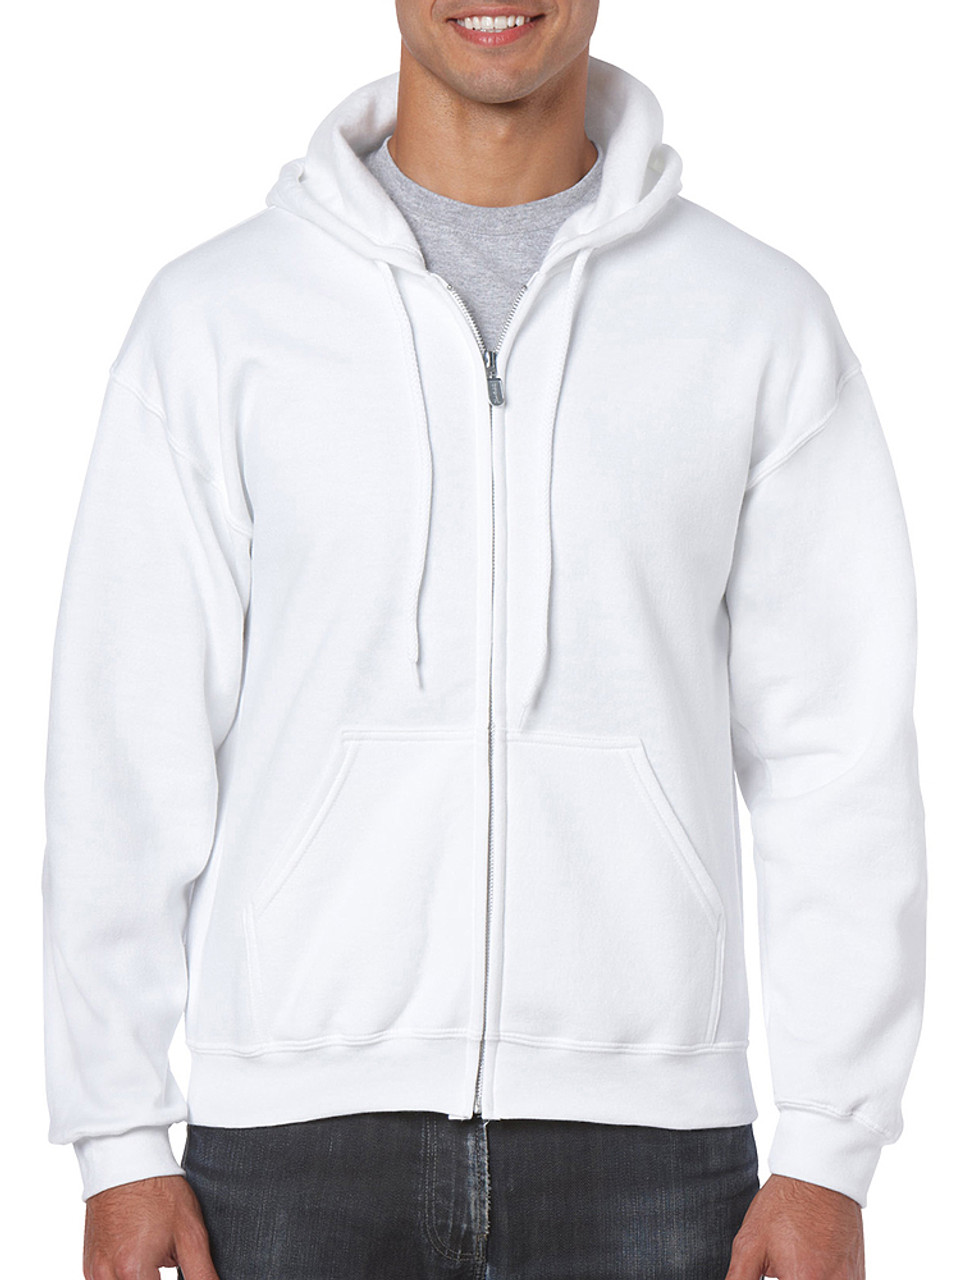 18600 Gildan 50/50 Full Zip Hooded Sweatshirt   T-shirt.ca